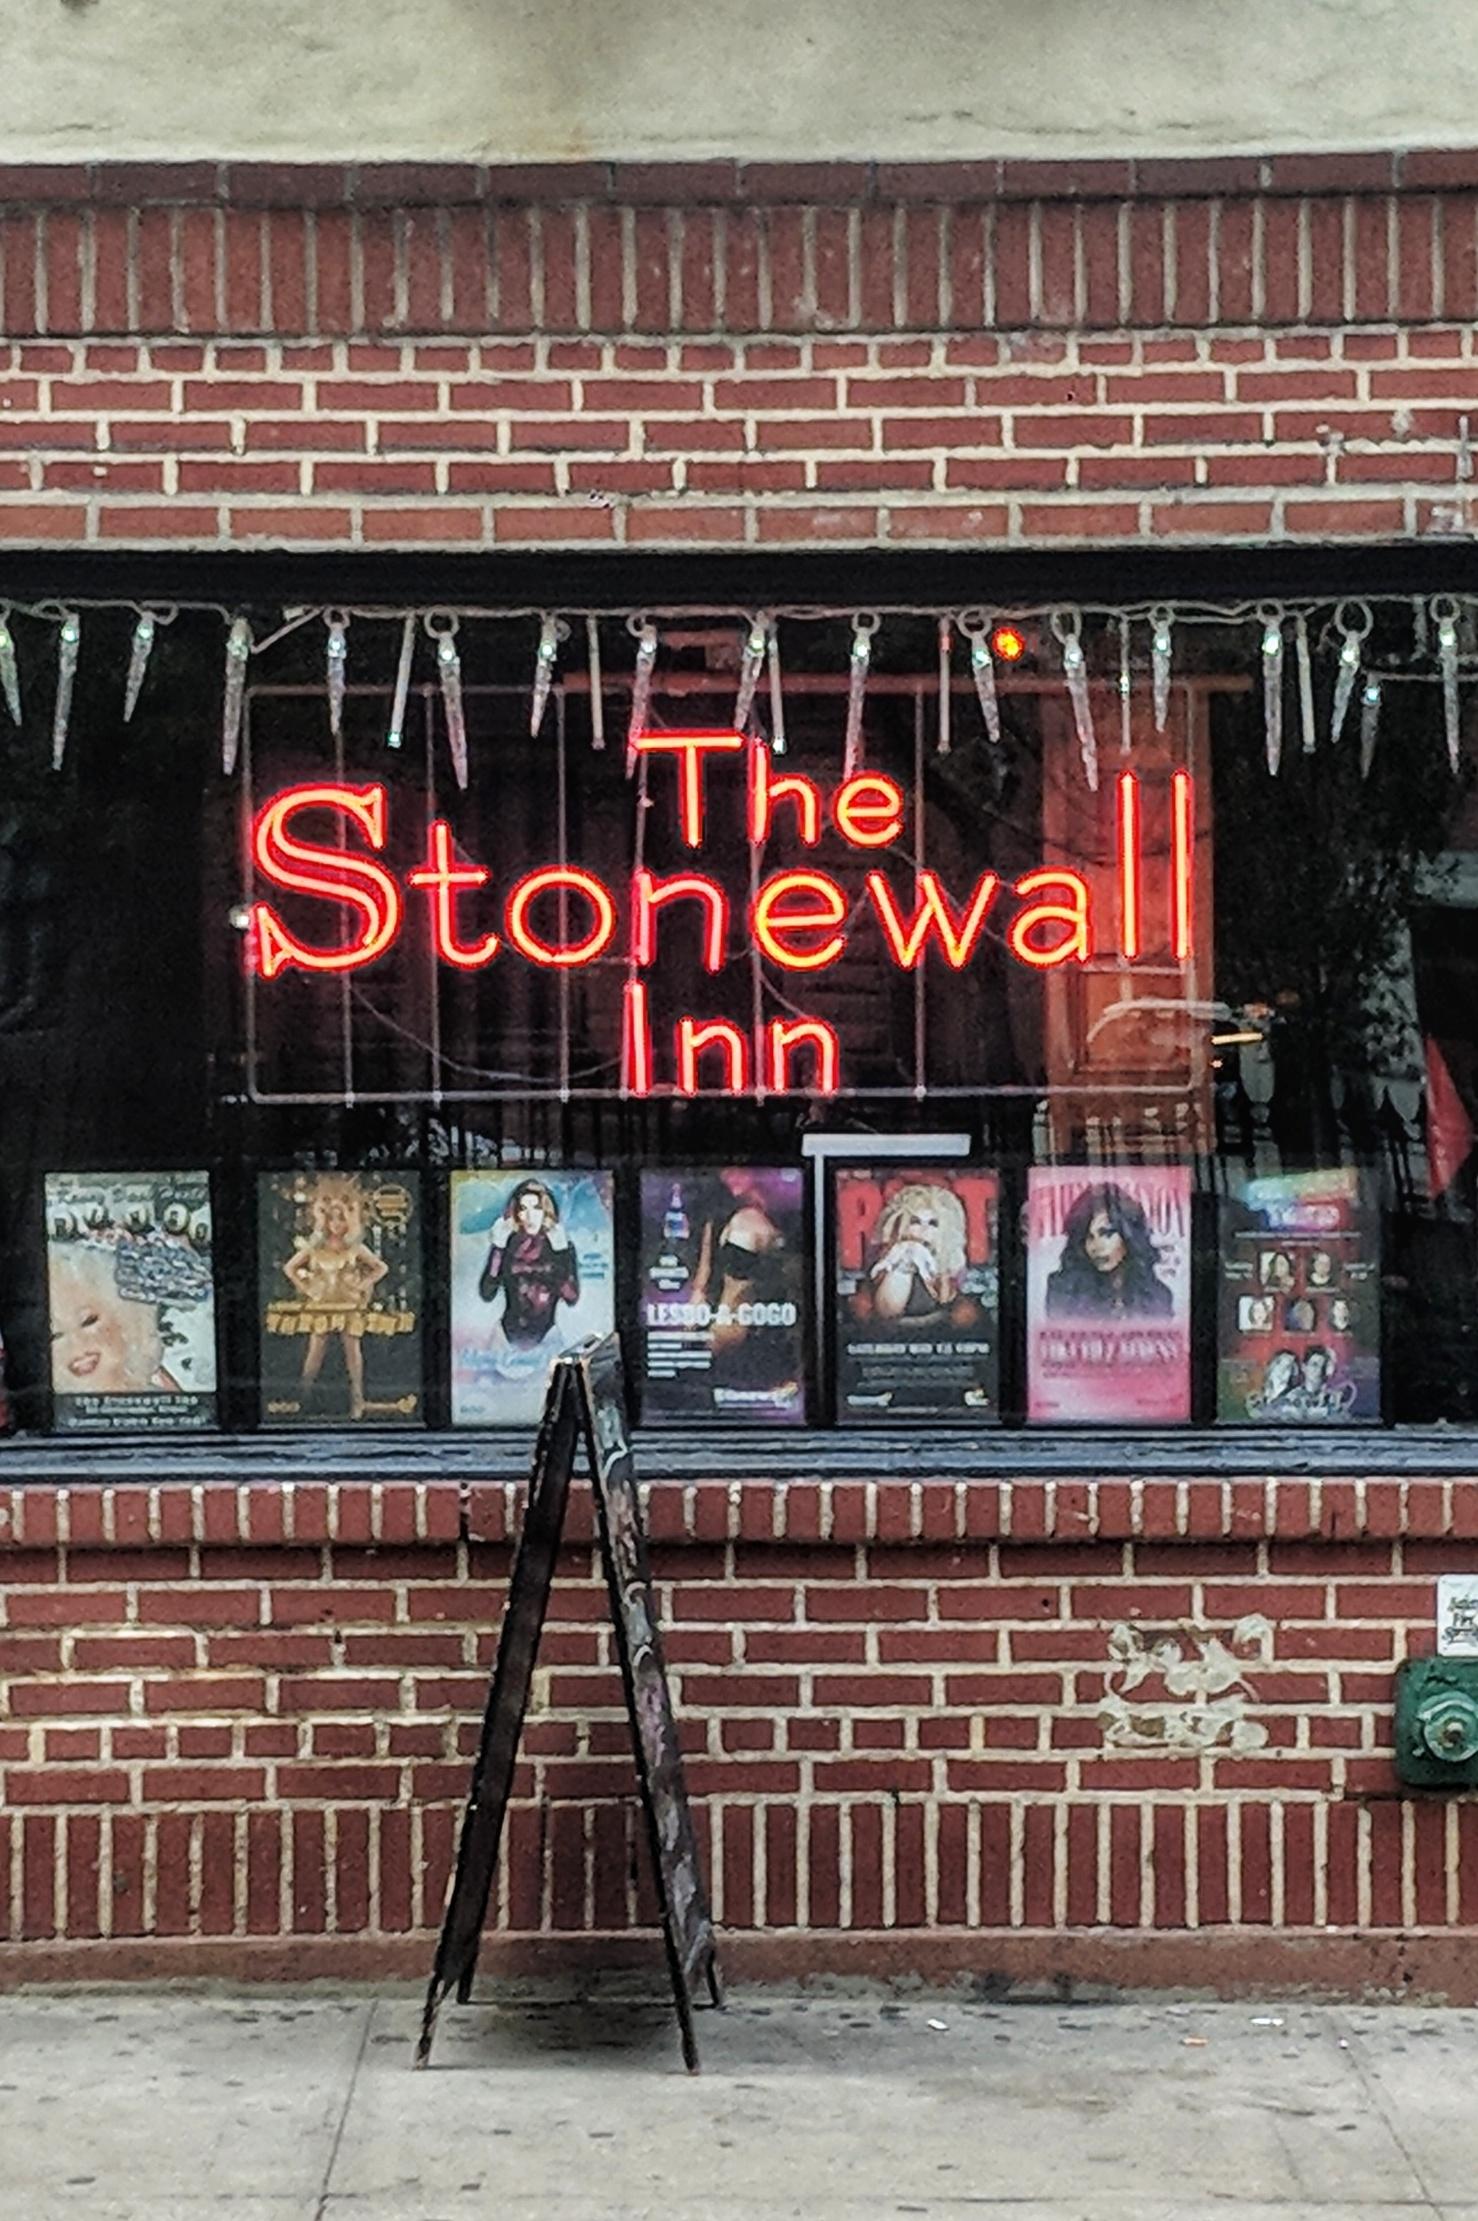 stonewall-inn-adam-groffman.jpeg?1558870005